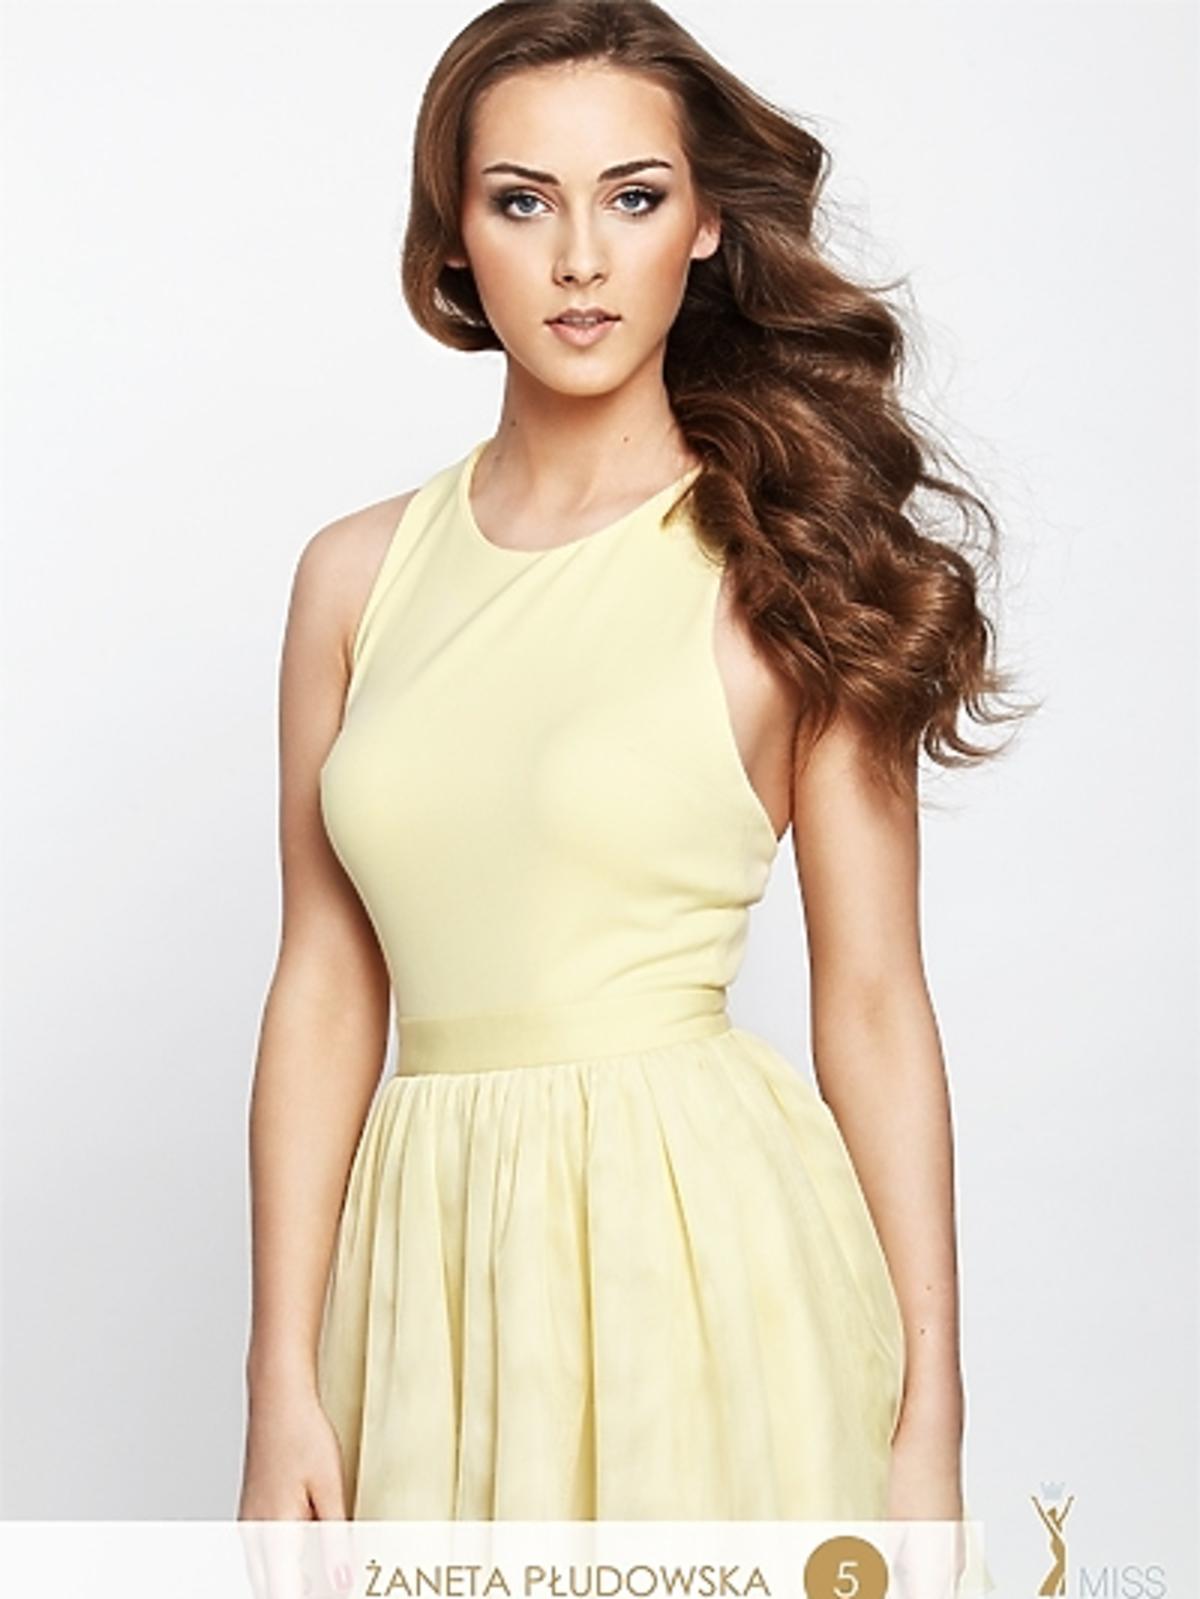 Żaneta Płudowska - kandydatka do tytułu Miss Polonia 2012